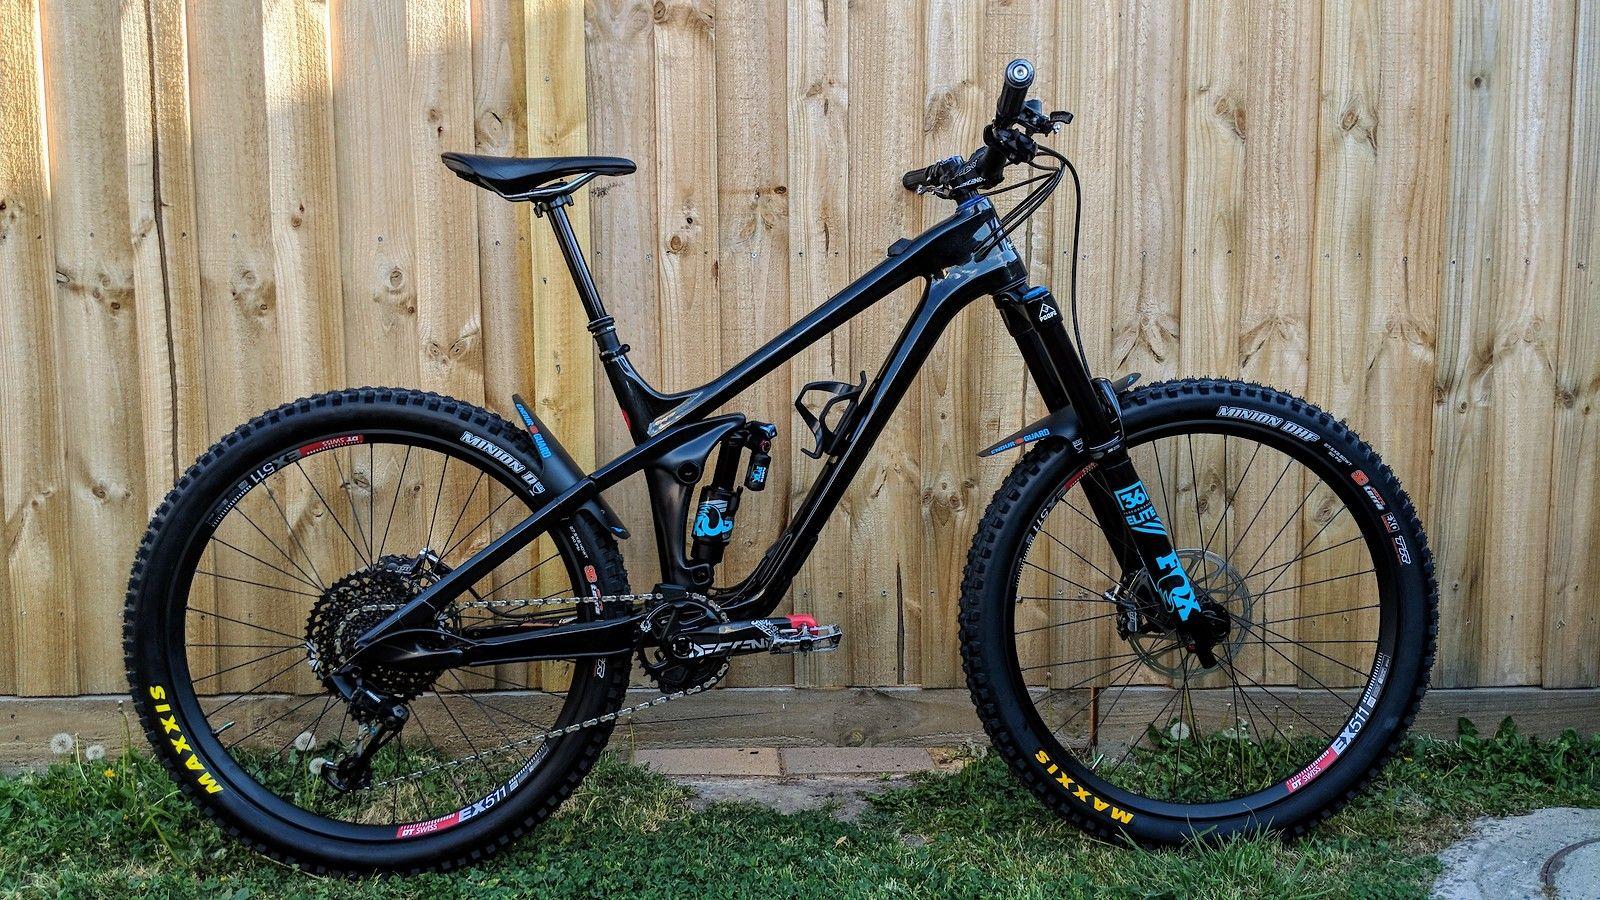 2019 Rocky Mountain Slayer Custom Jhw009 S Bike Check Vital